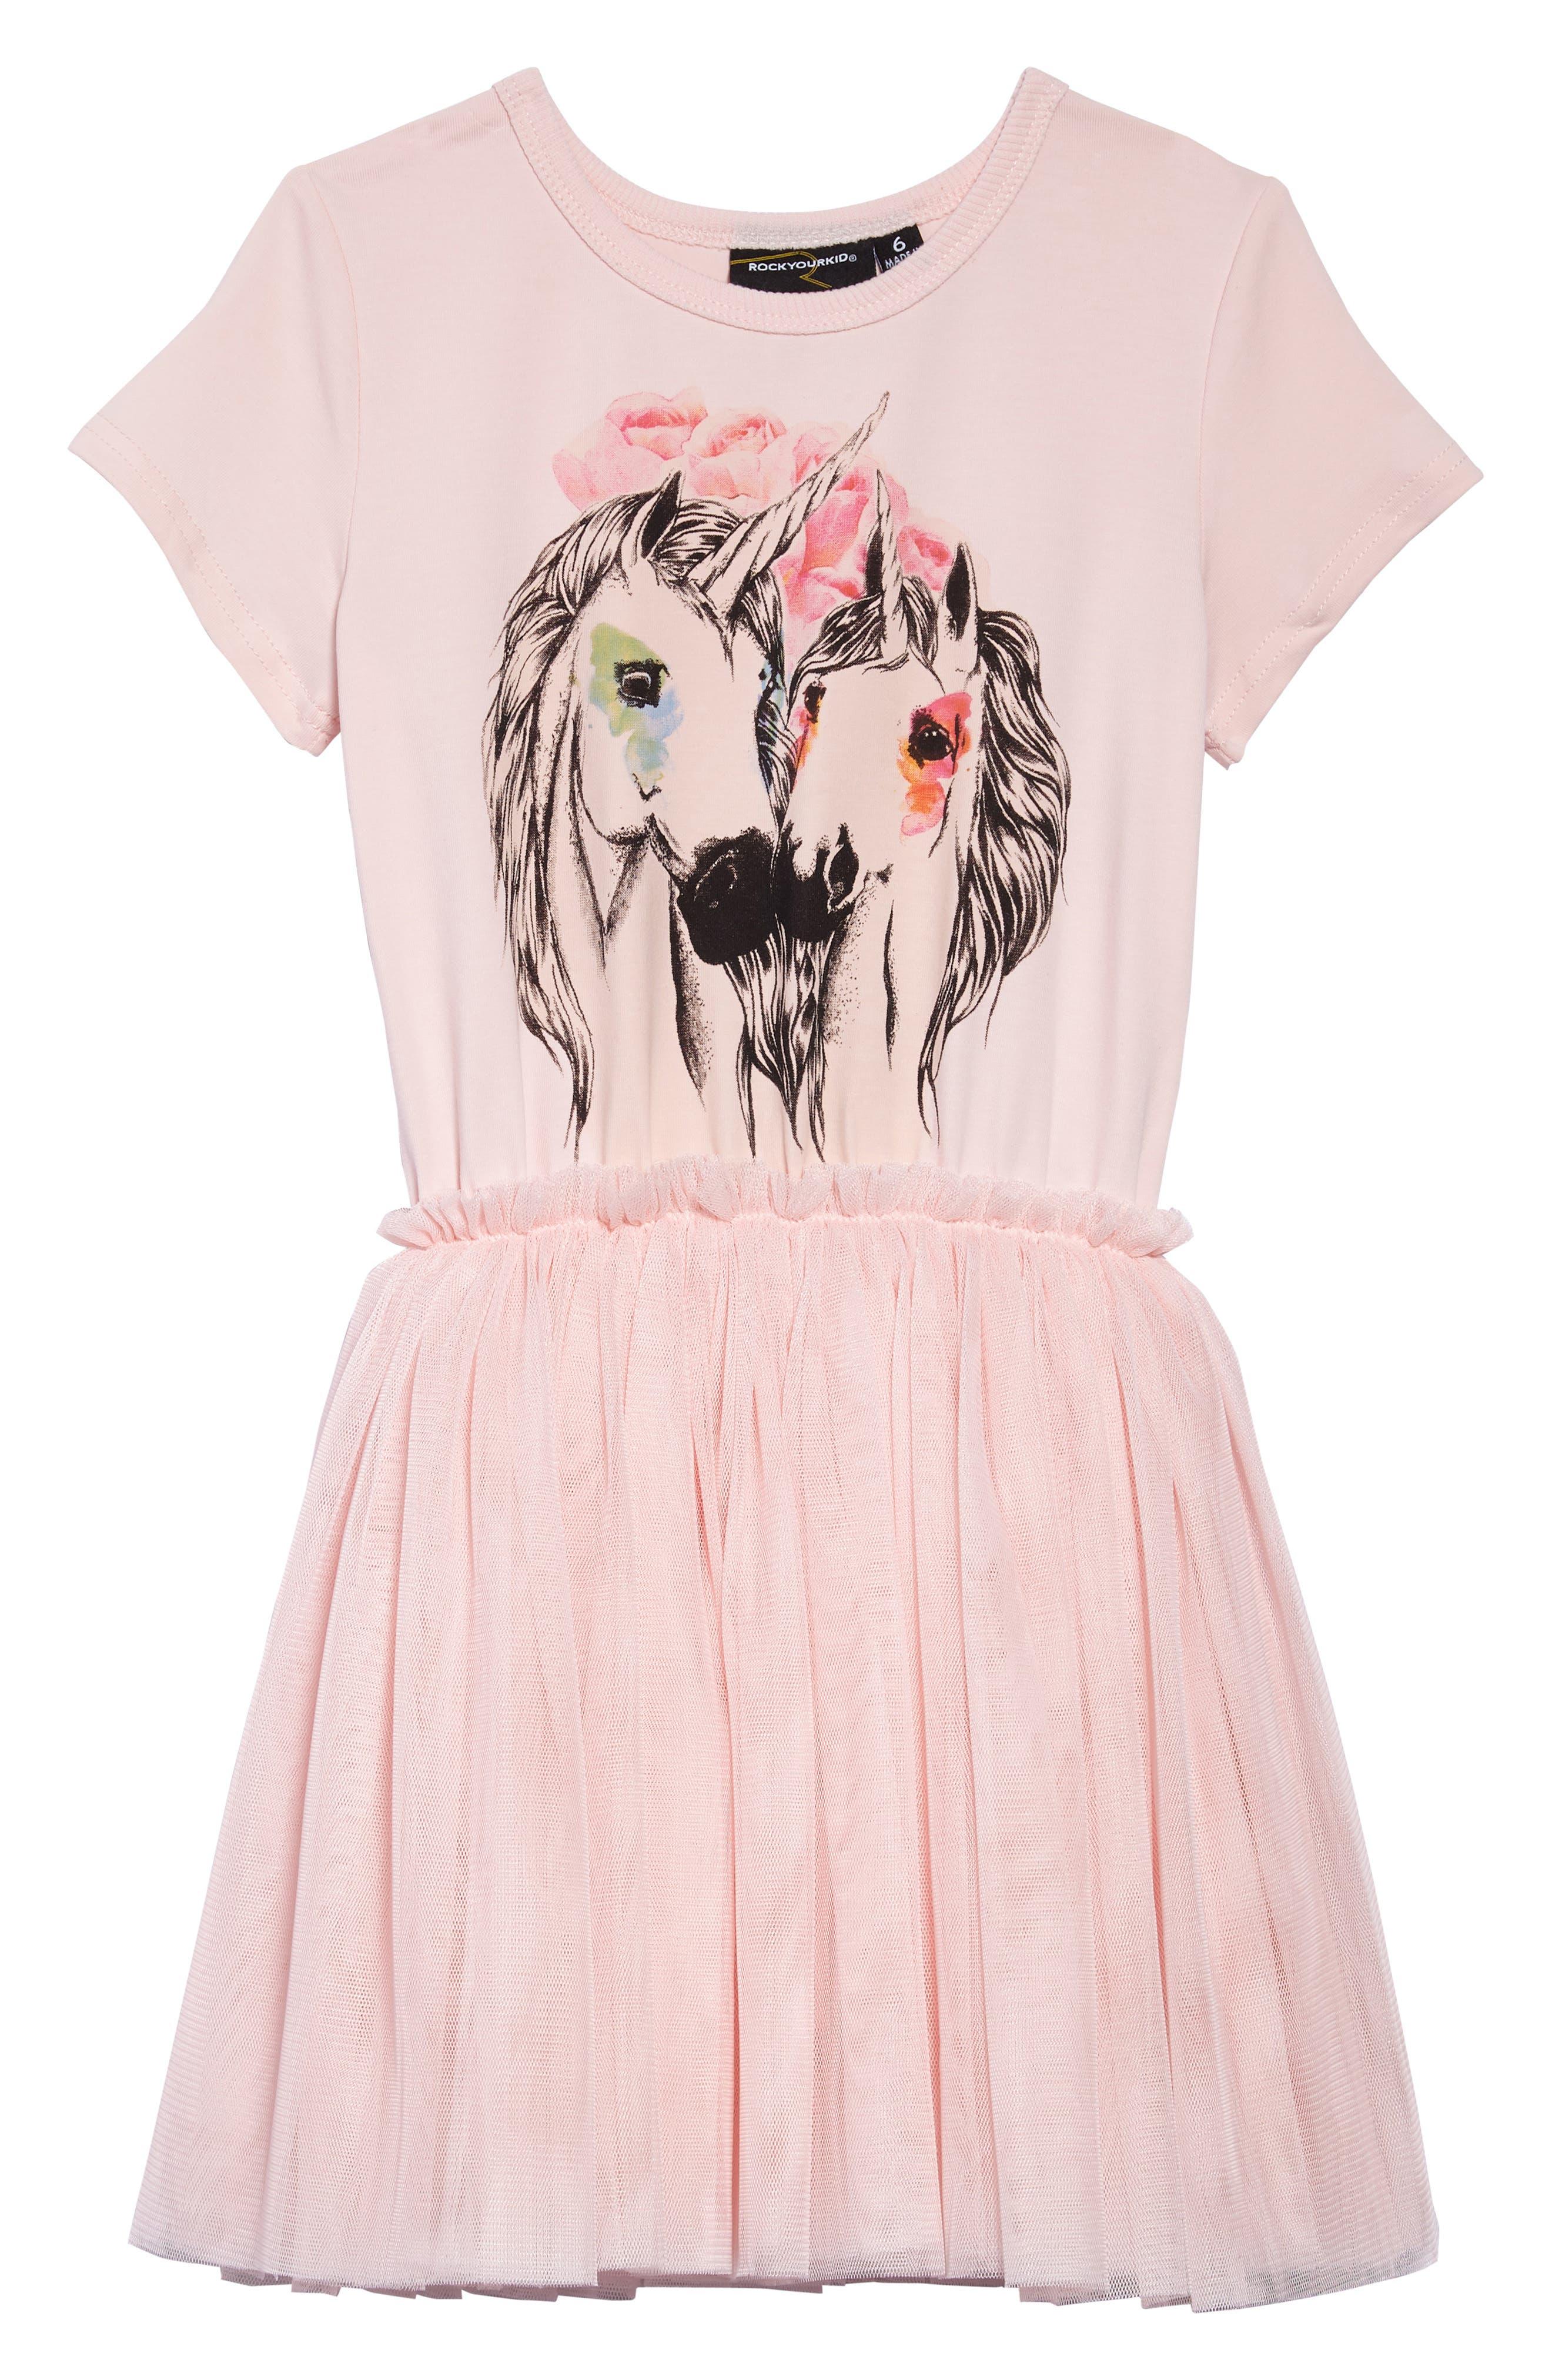 Rock Your Kid Unicorn Love Circus Dress (Toddler Girls & Little Girls)